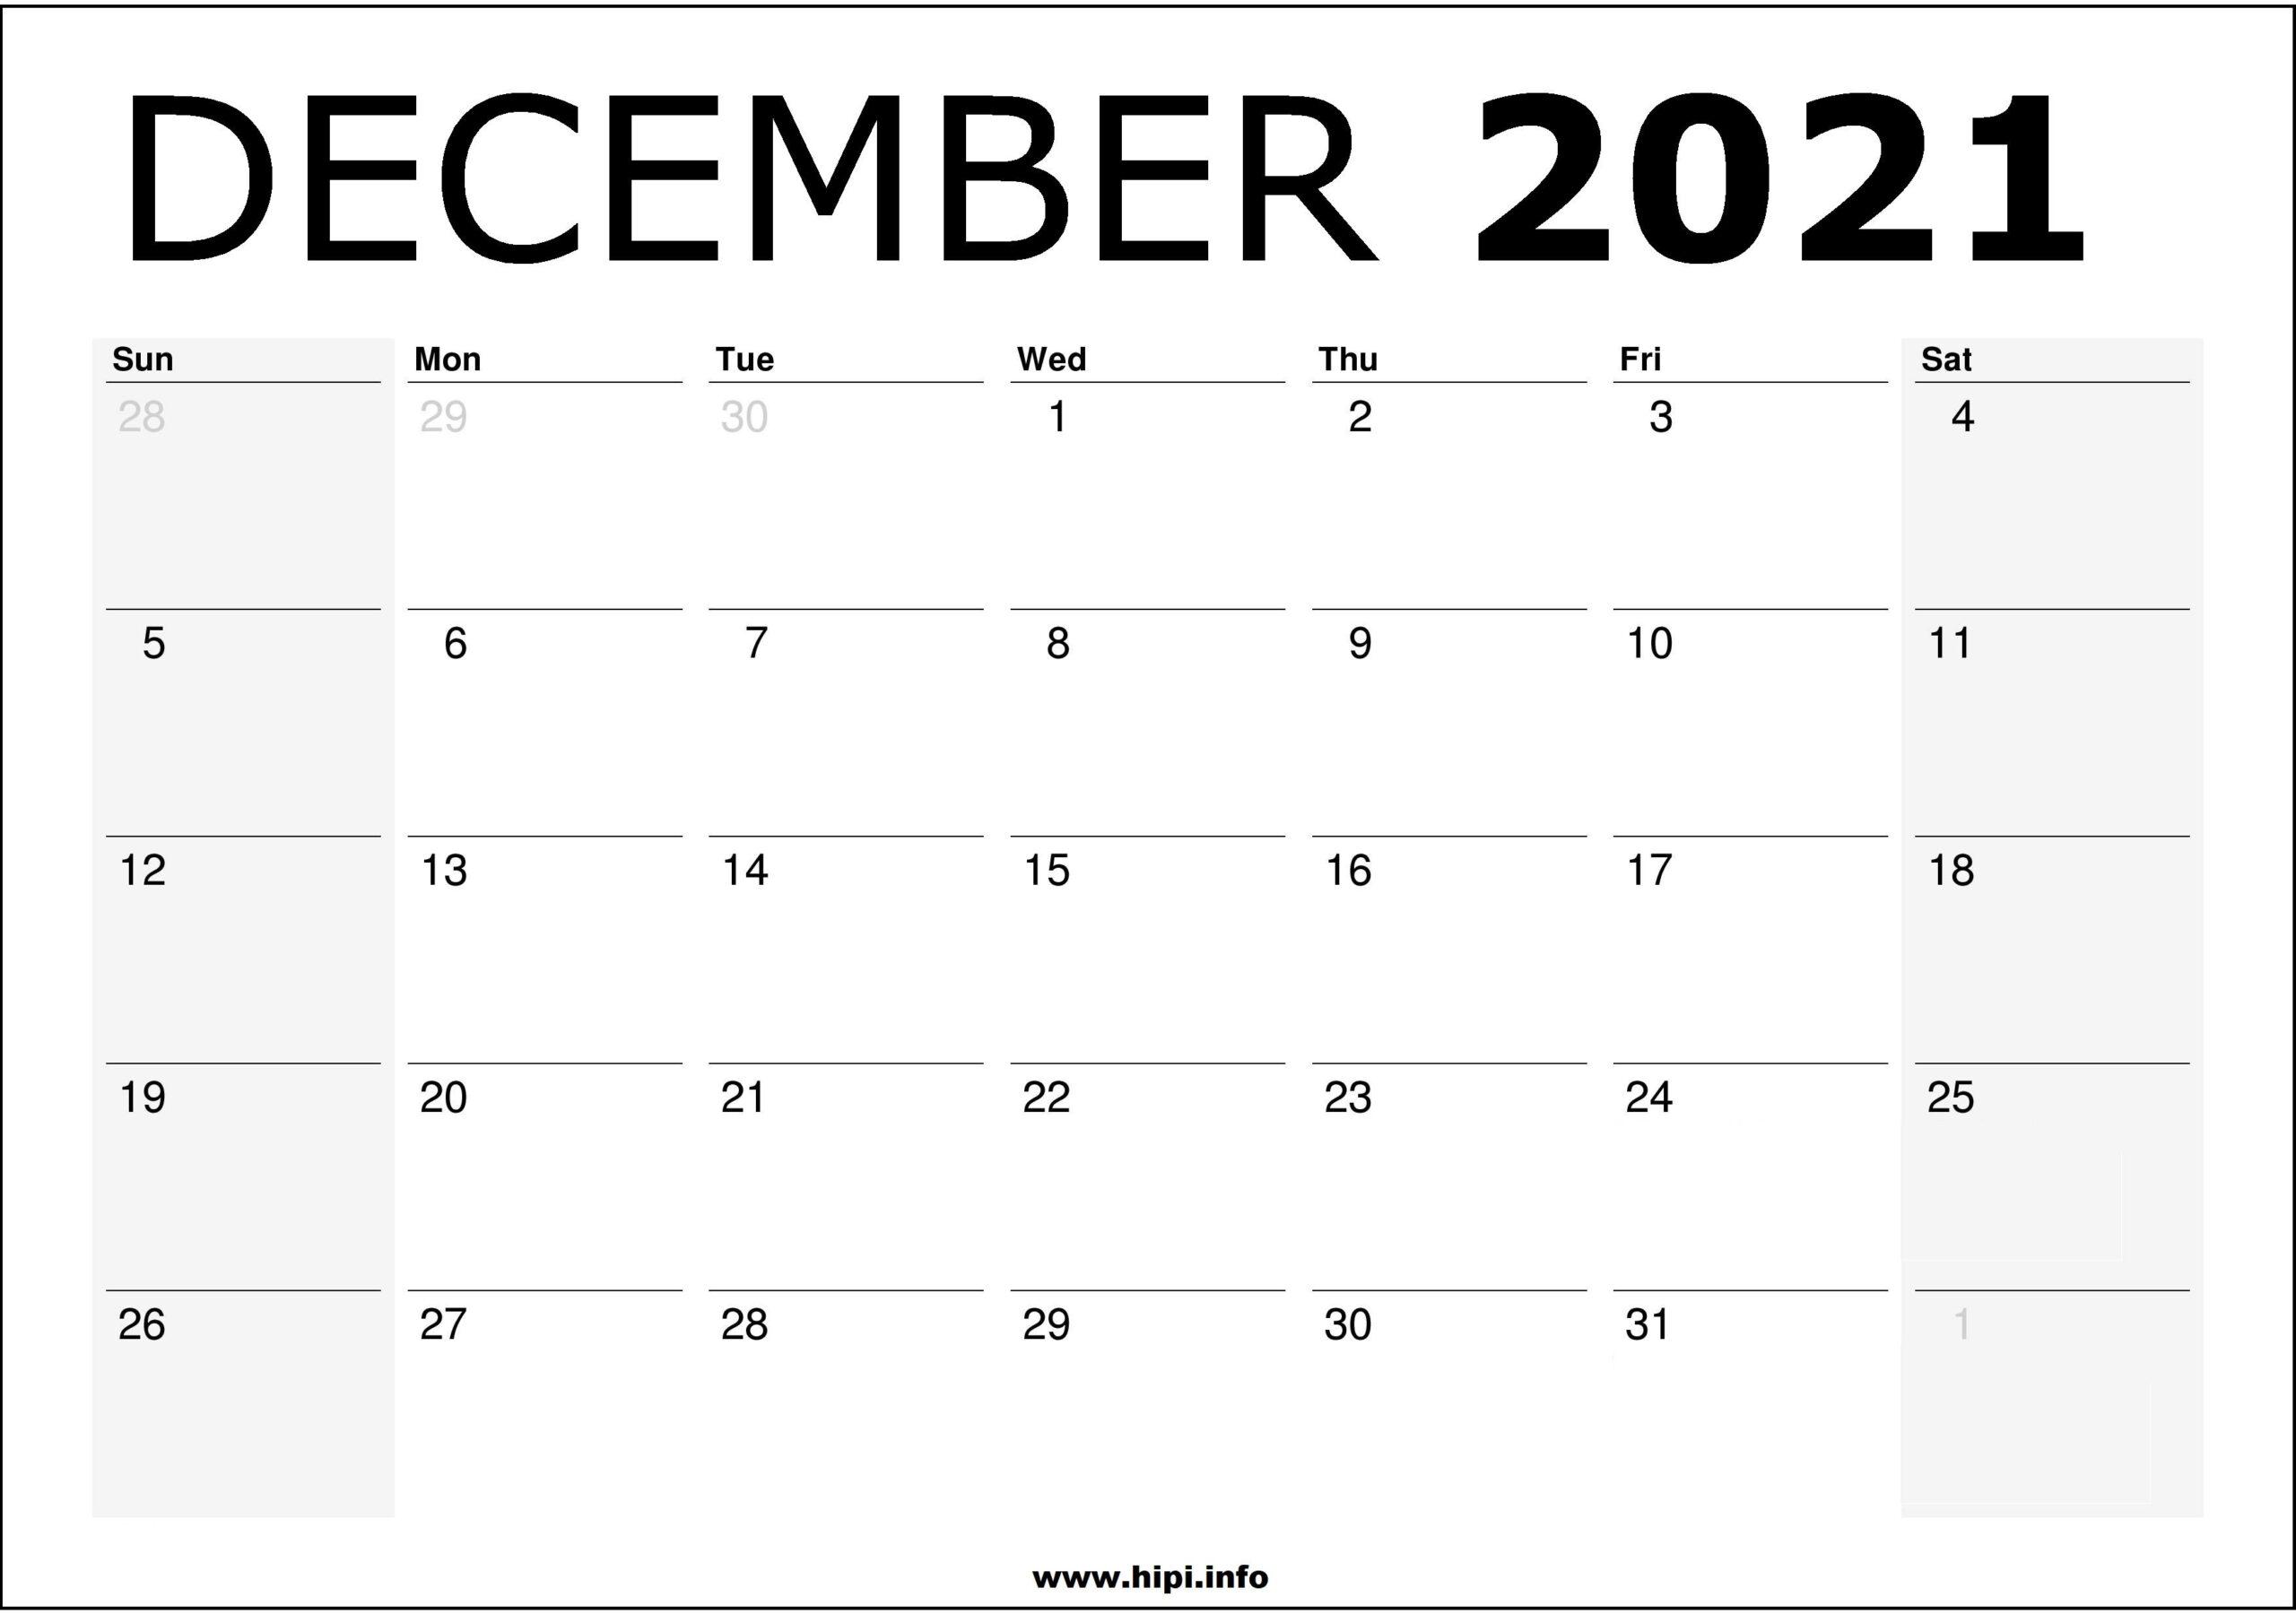 December 2021 Calendar Wallpapers - Wallpaper Cave